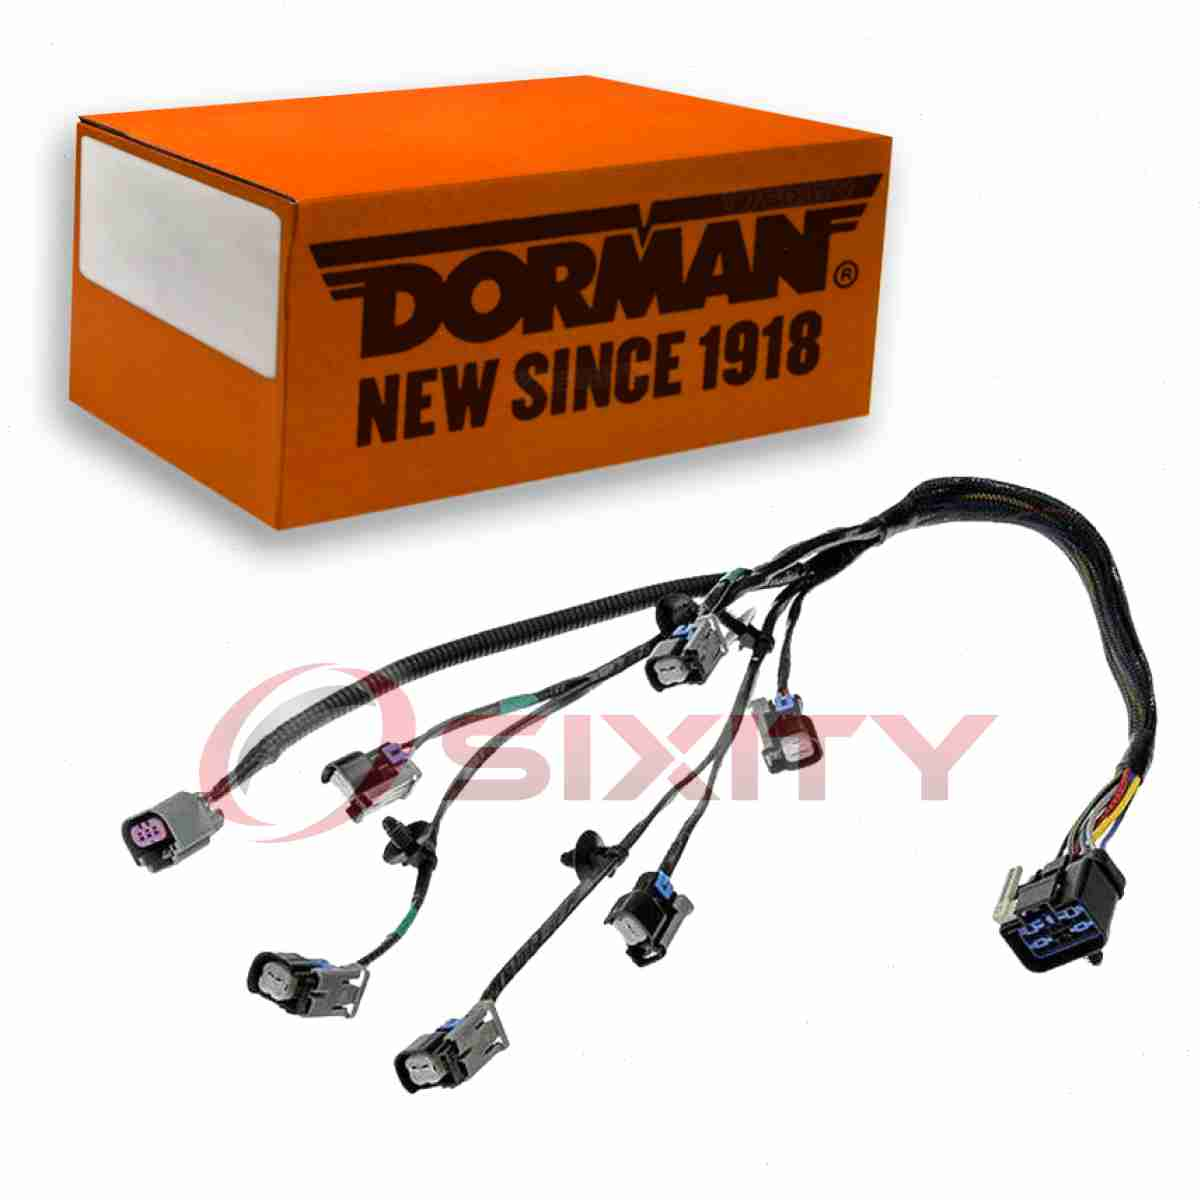 Details about Dorman Fuel Management Wiring Harness for Dodge Caravan on